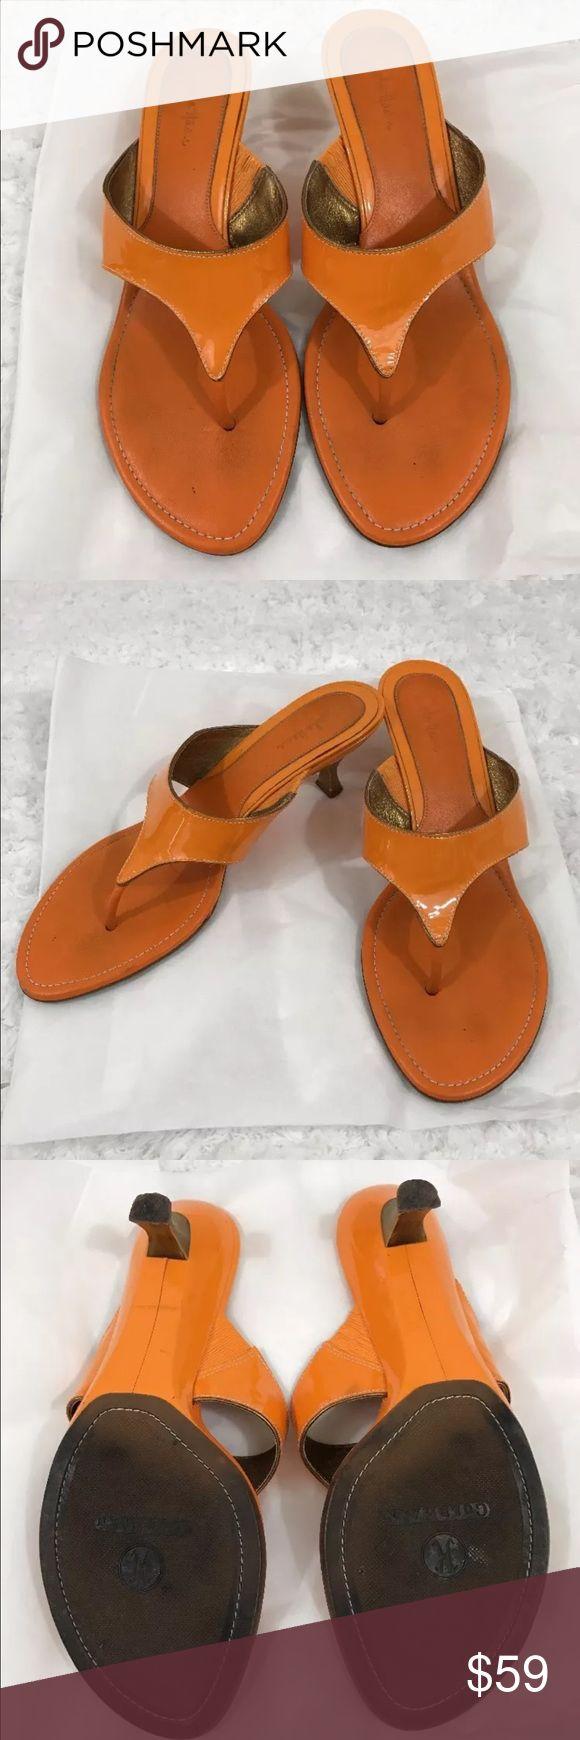 Cole Haan leather shoes slides sandal Pump size 8 This item is pre-owned Cole Haan leather slides sandal size 8 orange and gold excellent condition Cole Haan Shoes Sandals